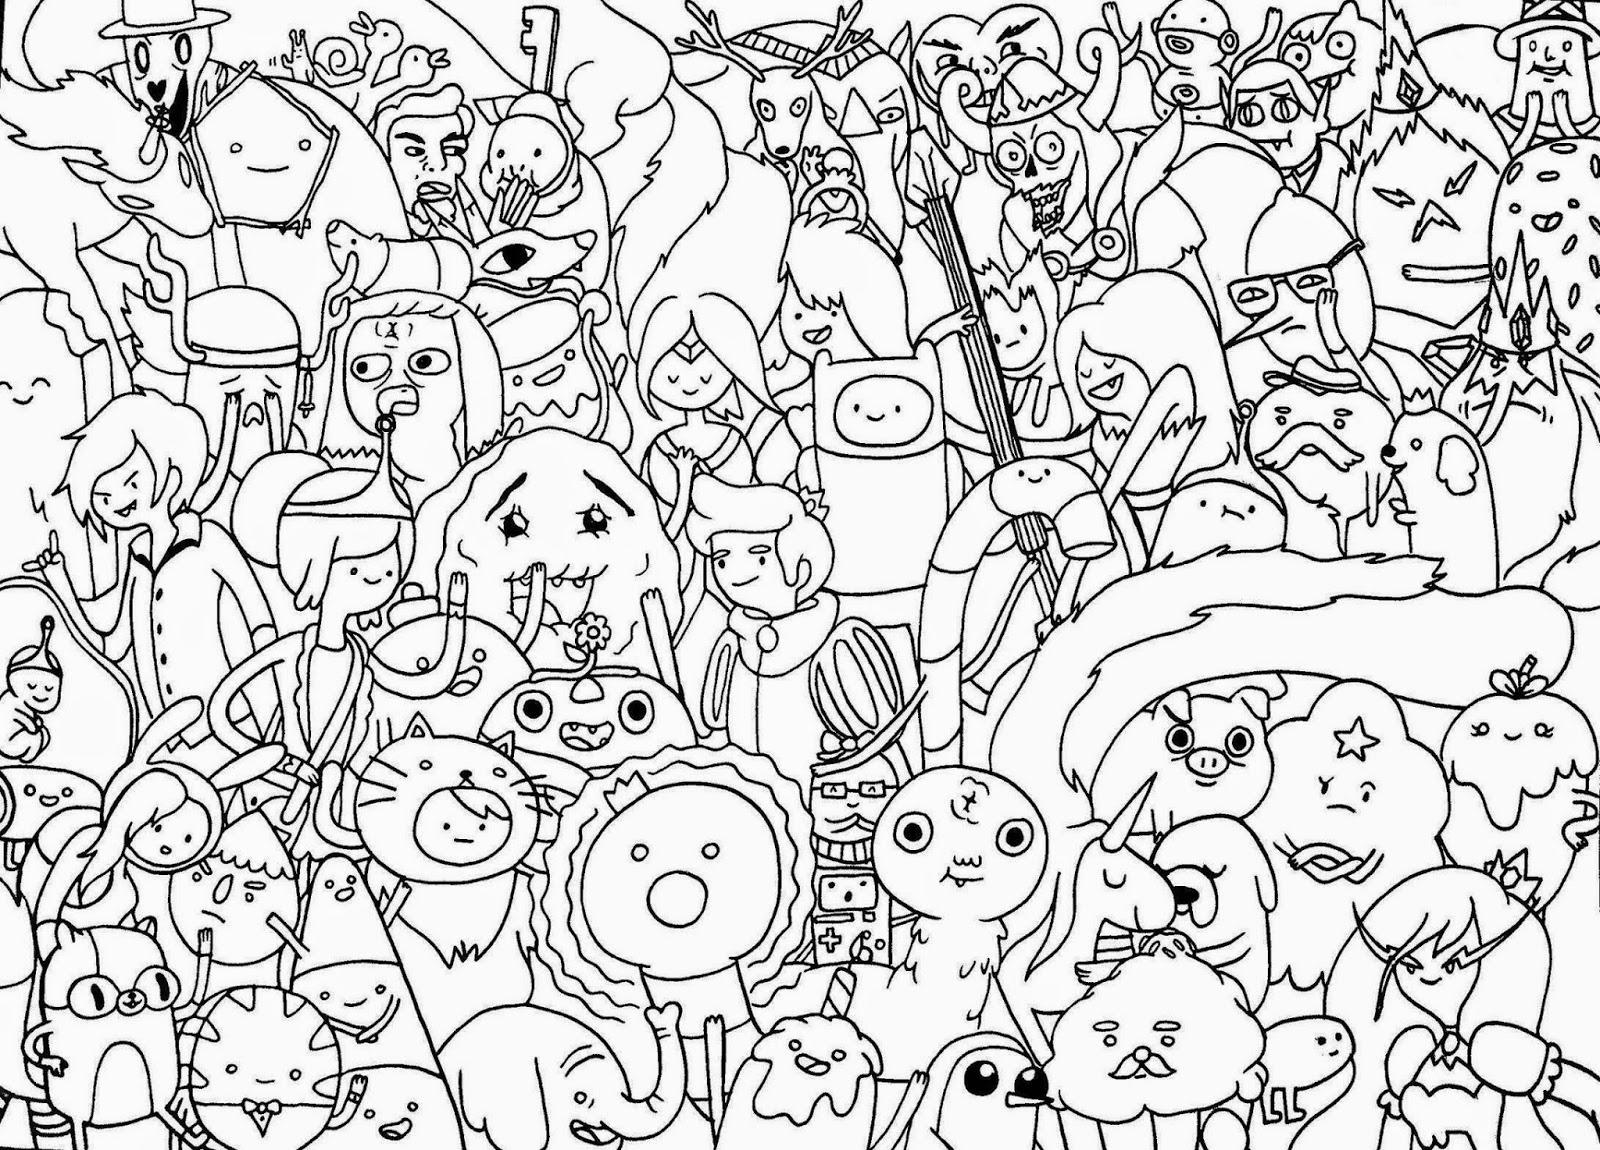 Pora Na Przygode Kolorowanki on Spongebob Coloring Pages For Kids 2016